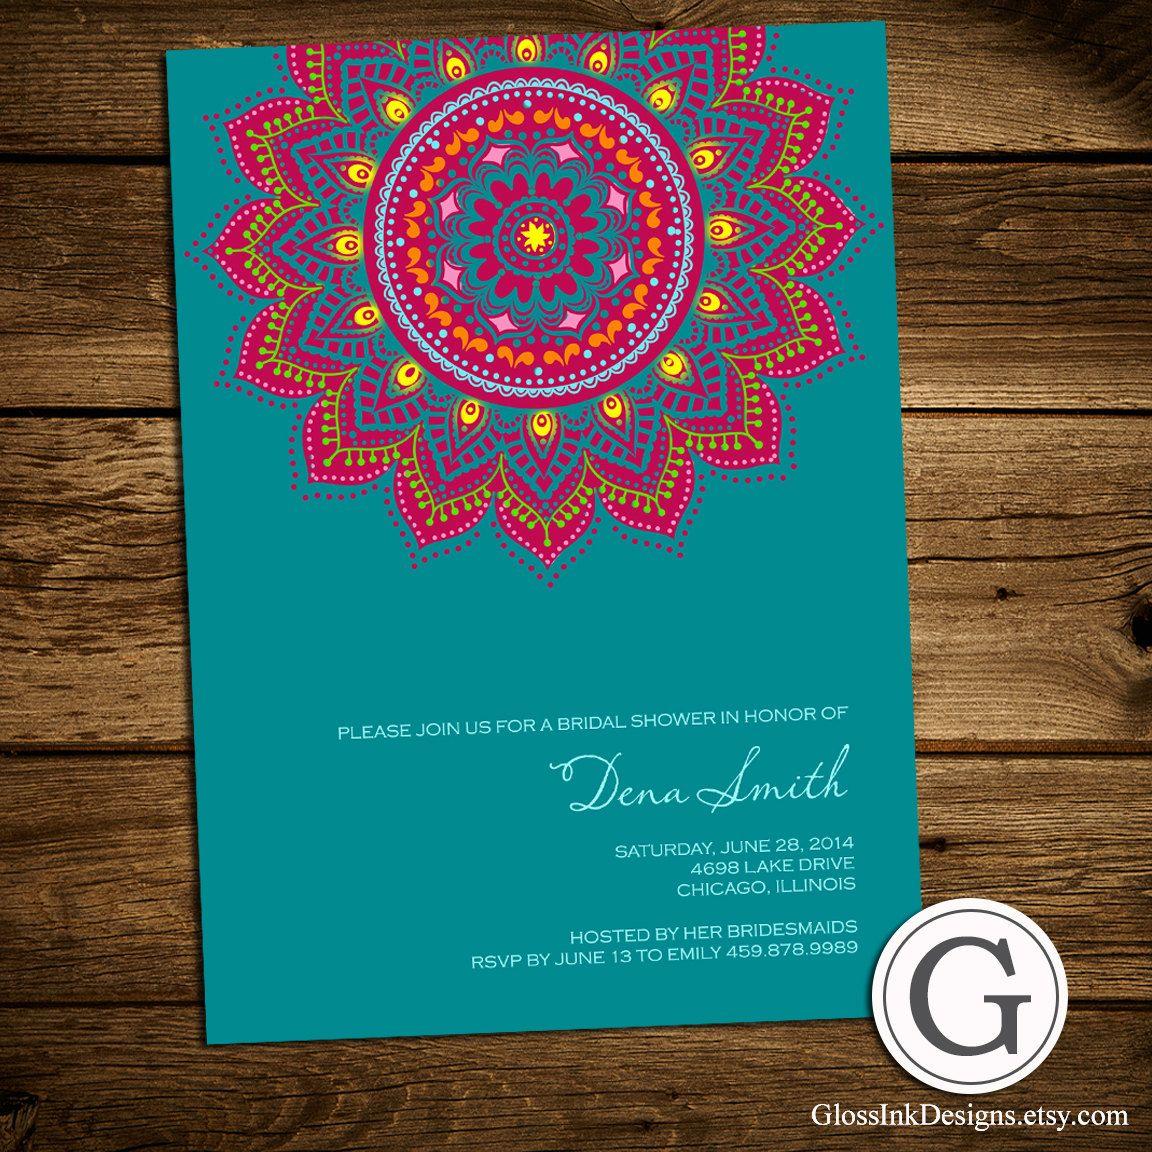 Bridal Shower Invitation - Traditional Henna, mehndi design, Eid ...